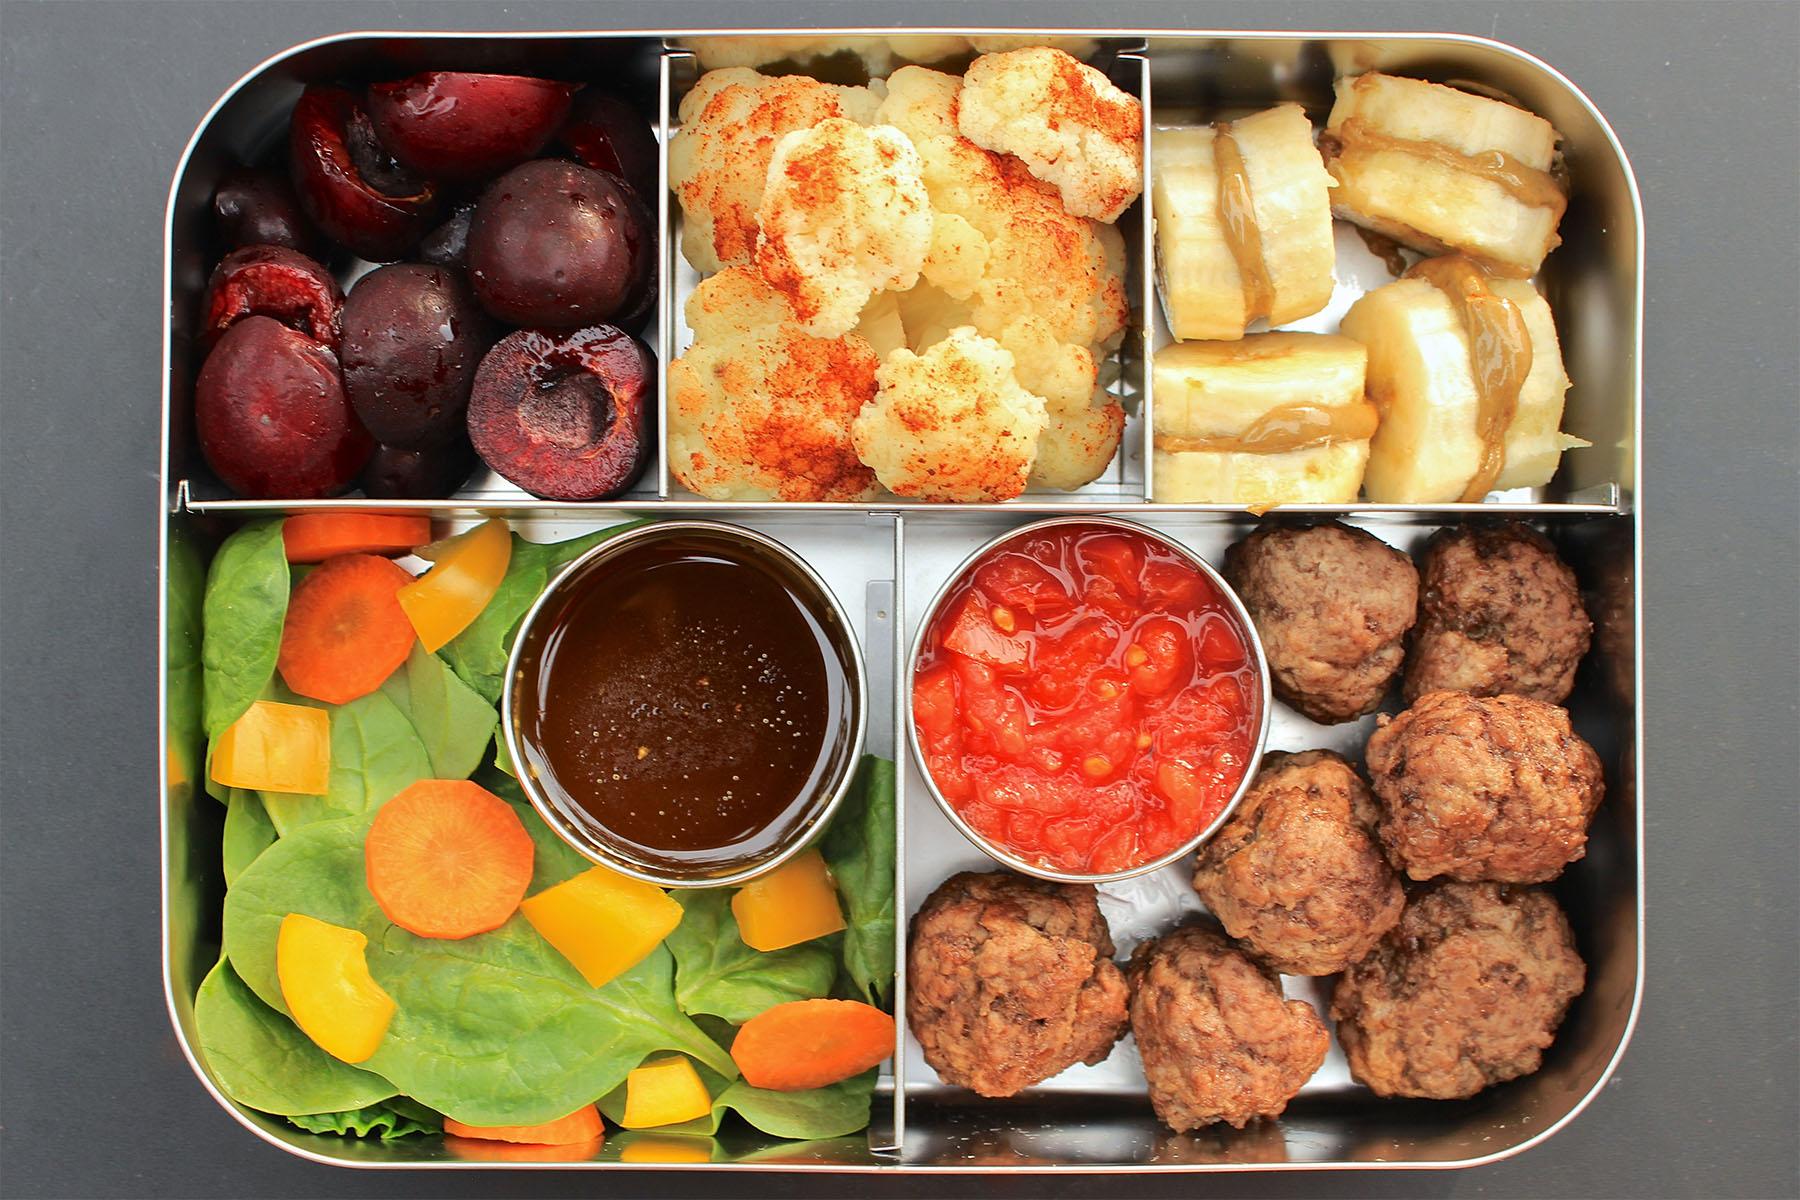 meatballs-bento-box